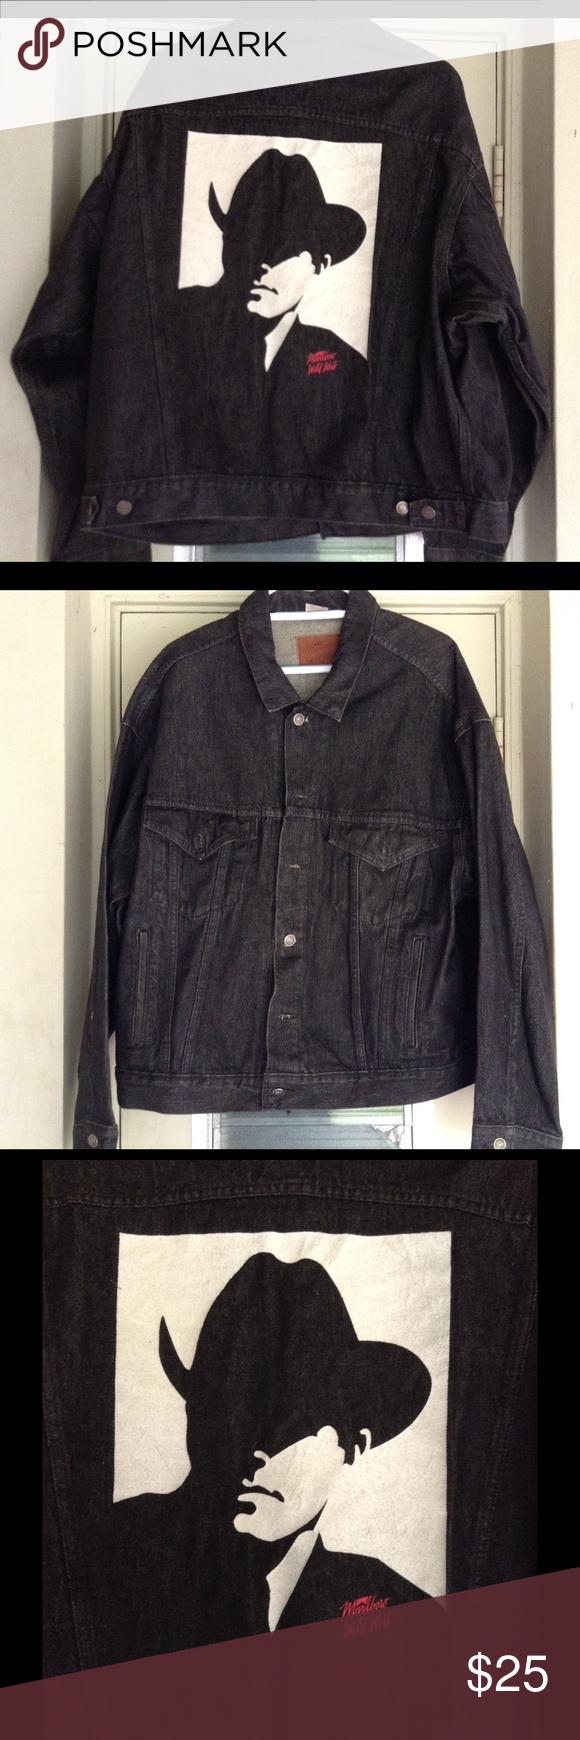 Men's Marlboro man denim jacket Men's black Marlboro man Wild West denim jacket. Jackets & Coats